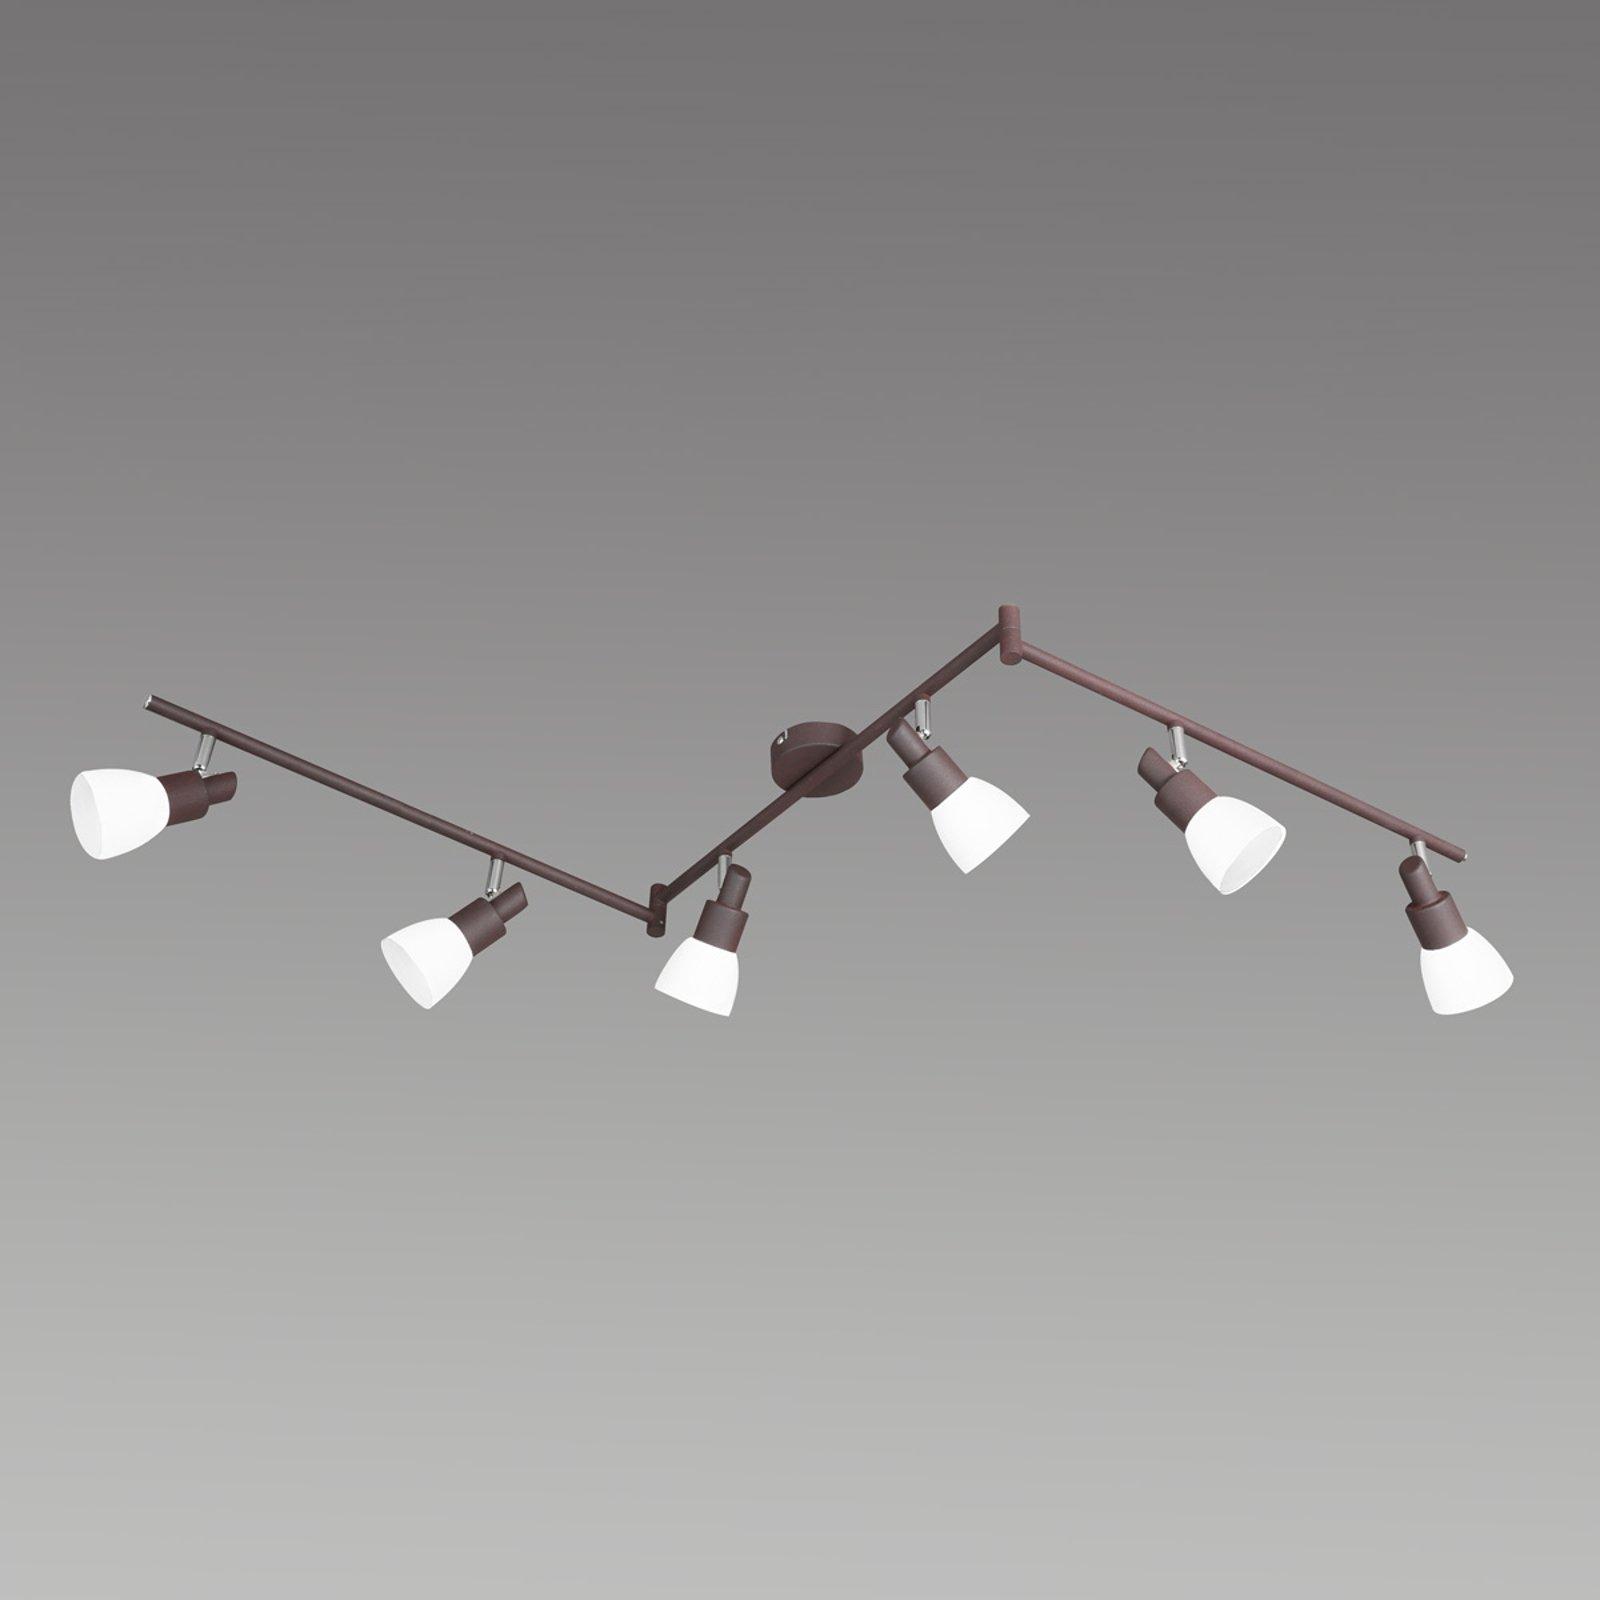 LED-taklampe Eve i antikkbrunt, 6 lys